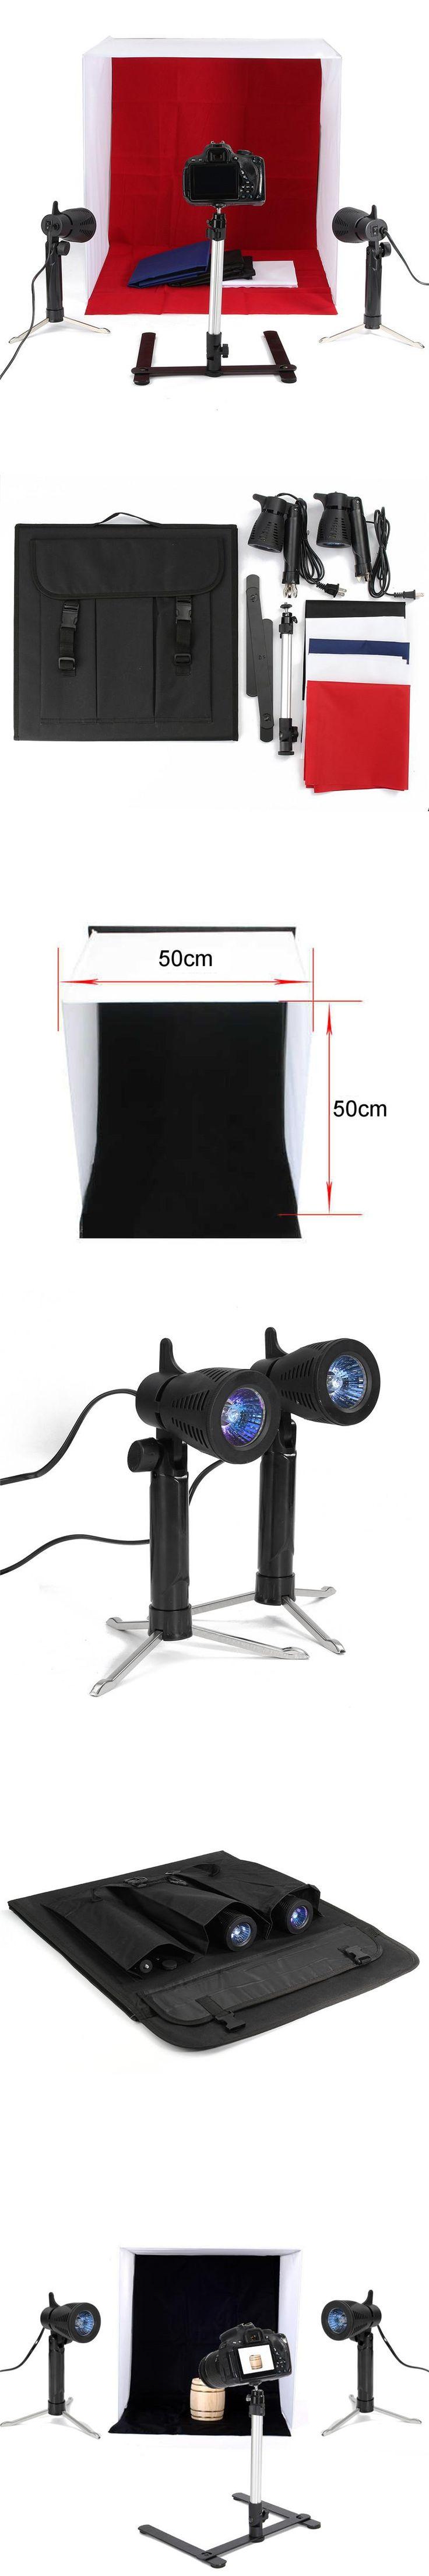 50x50CM Room Photo Studio Light Photography Lighting Tent Kit Backdrop Cube Box AC 110V-220V Photography Lighting Kit